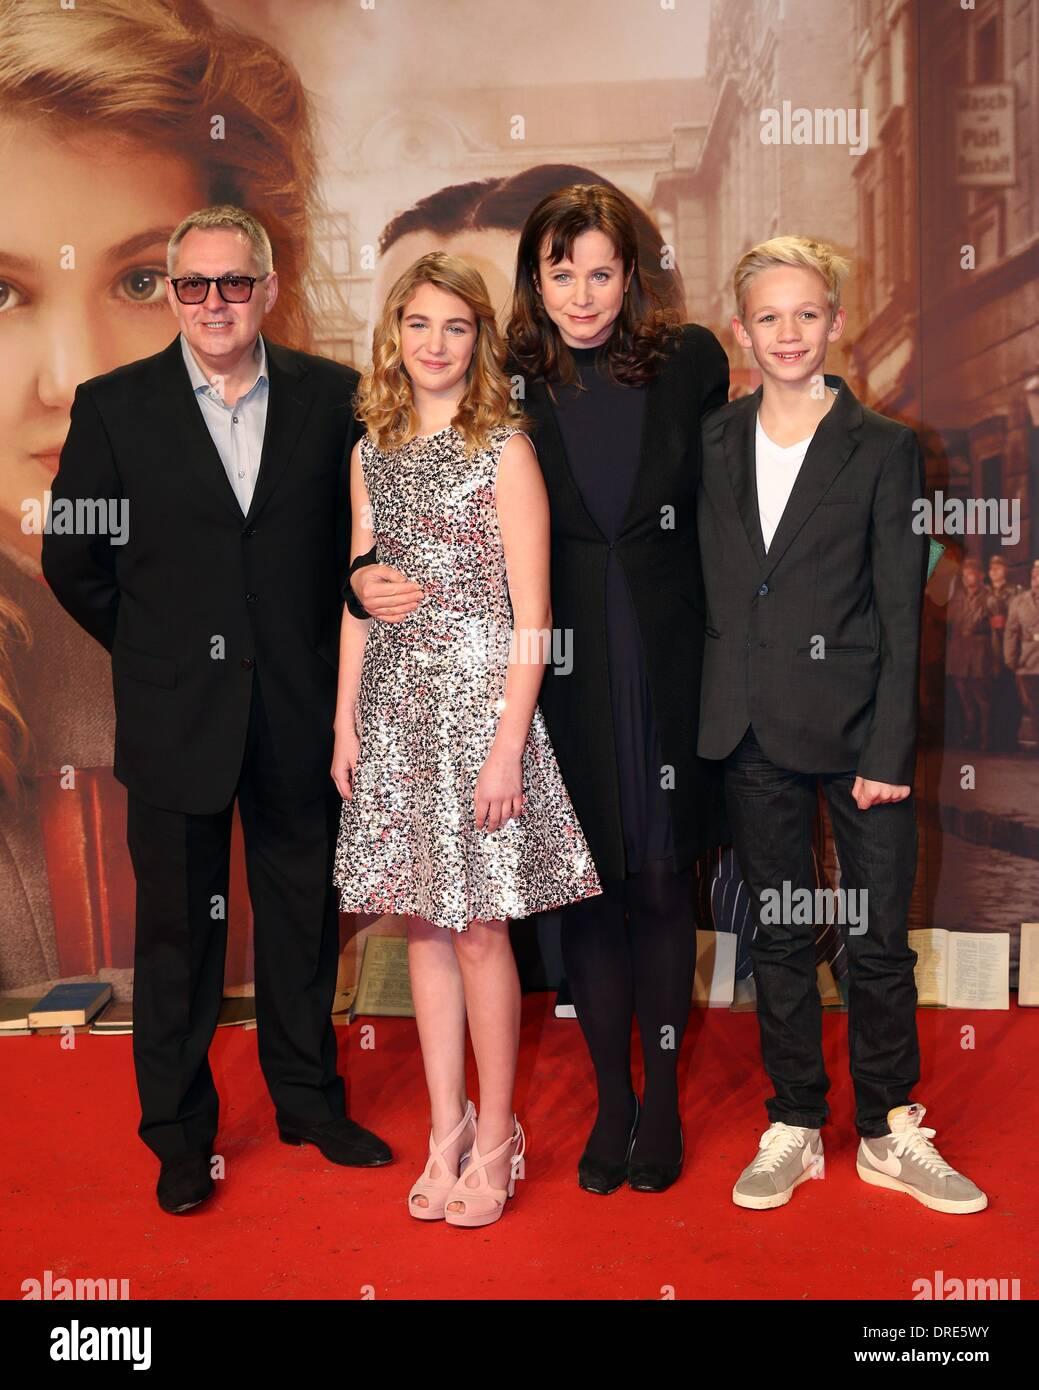 Nico liersch family - Director Brian S Percival With His Actors Sophie Nelisse Emily Watson Und Nico Liersch